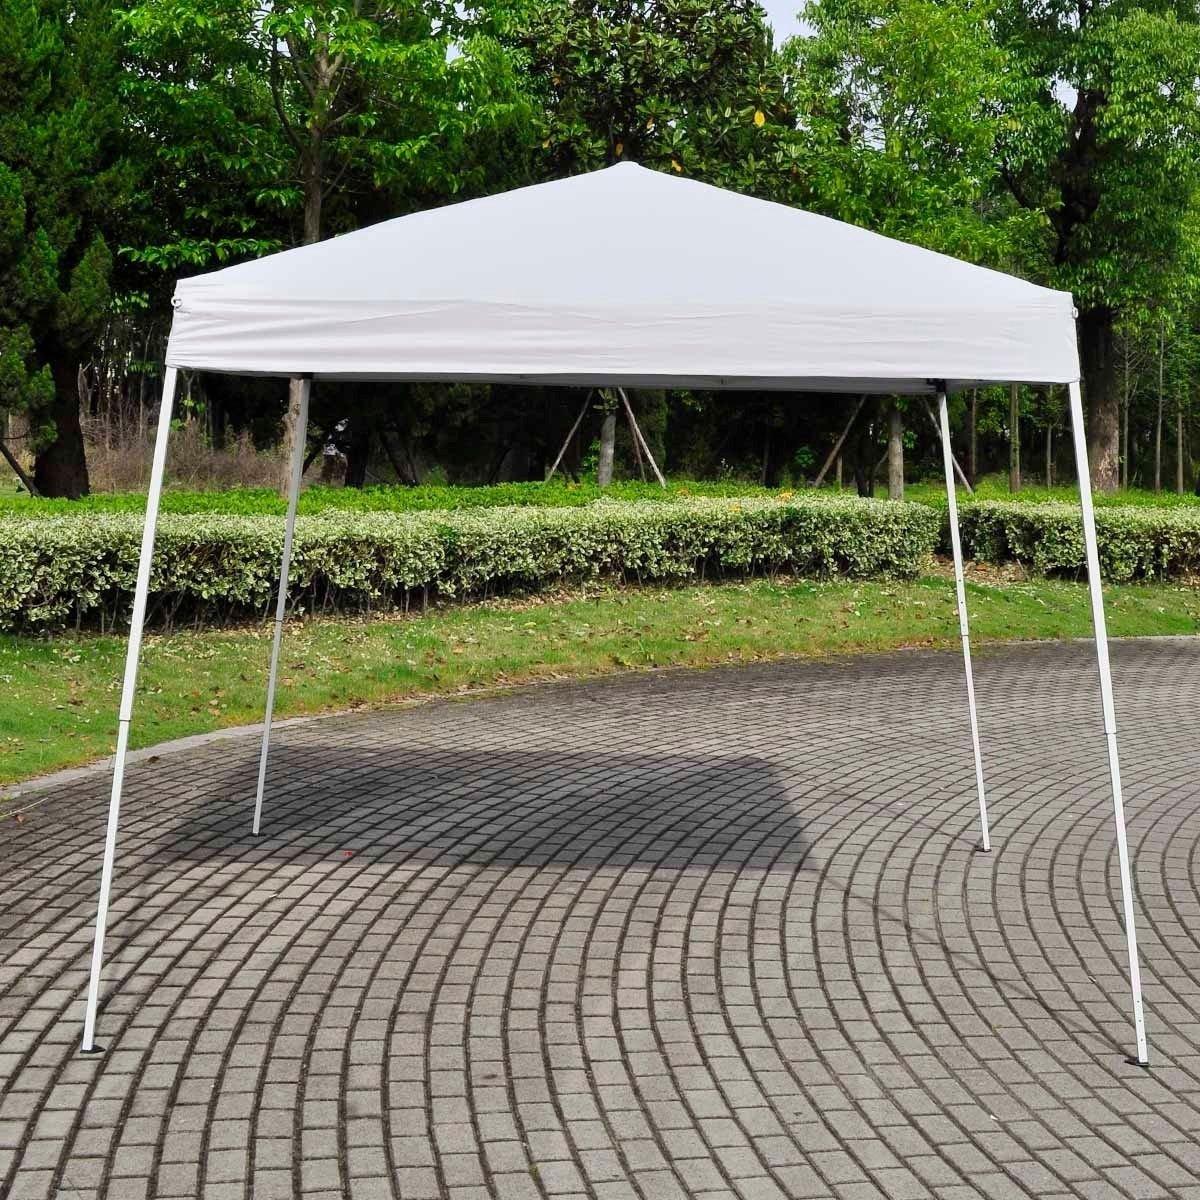 amazoncom strong camel ez pop up wedding party tent folding gazebo beach canopy wcarry bagwhite sports fan canopies garden u0026 outdoor